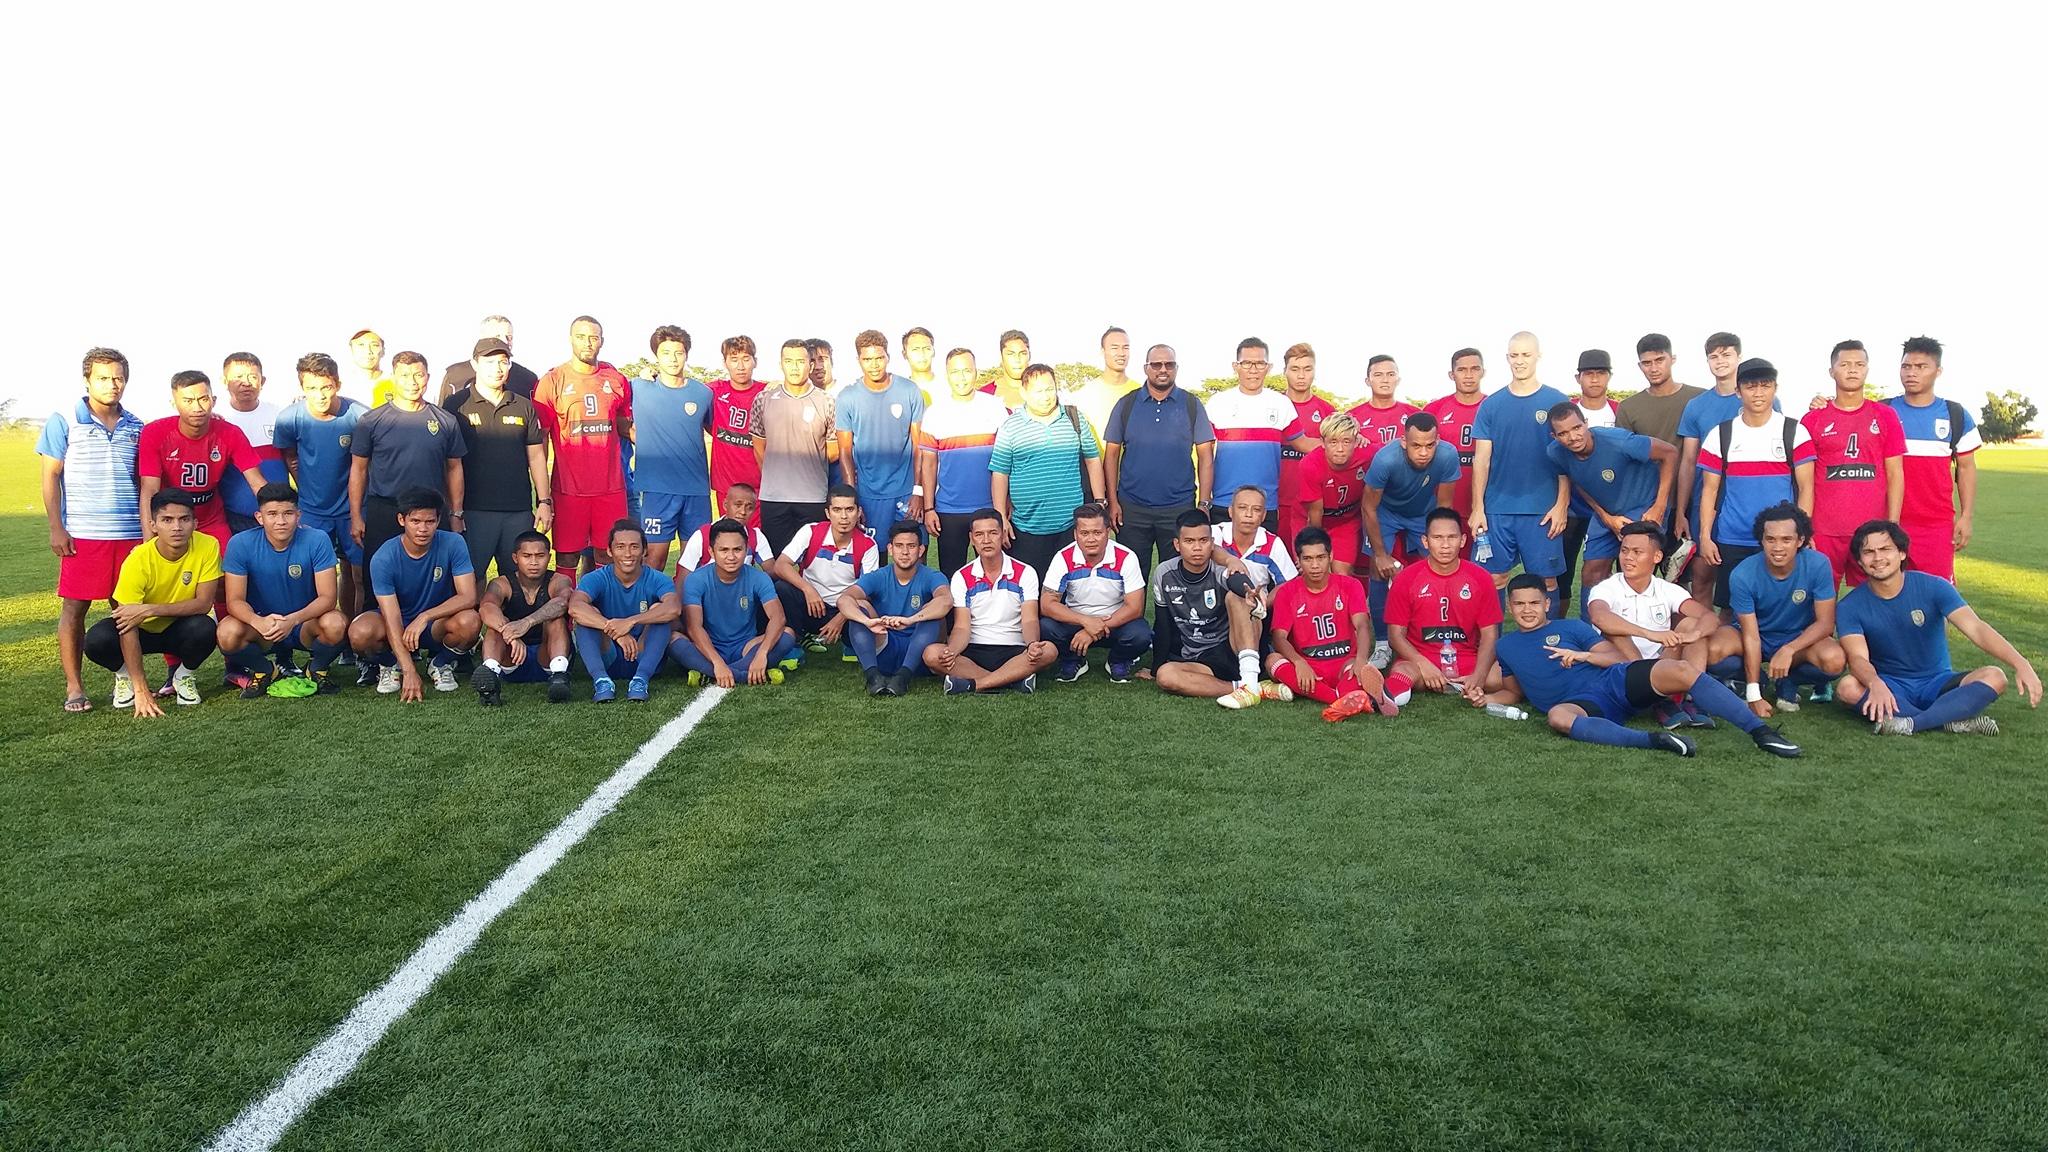 Analisis Perlawanan Persahabatan Antarabangsa: Global Cebu FC mln Sabah. 23 Jan 2018